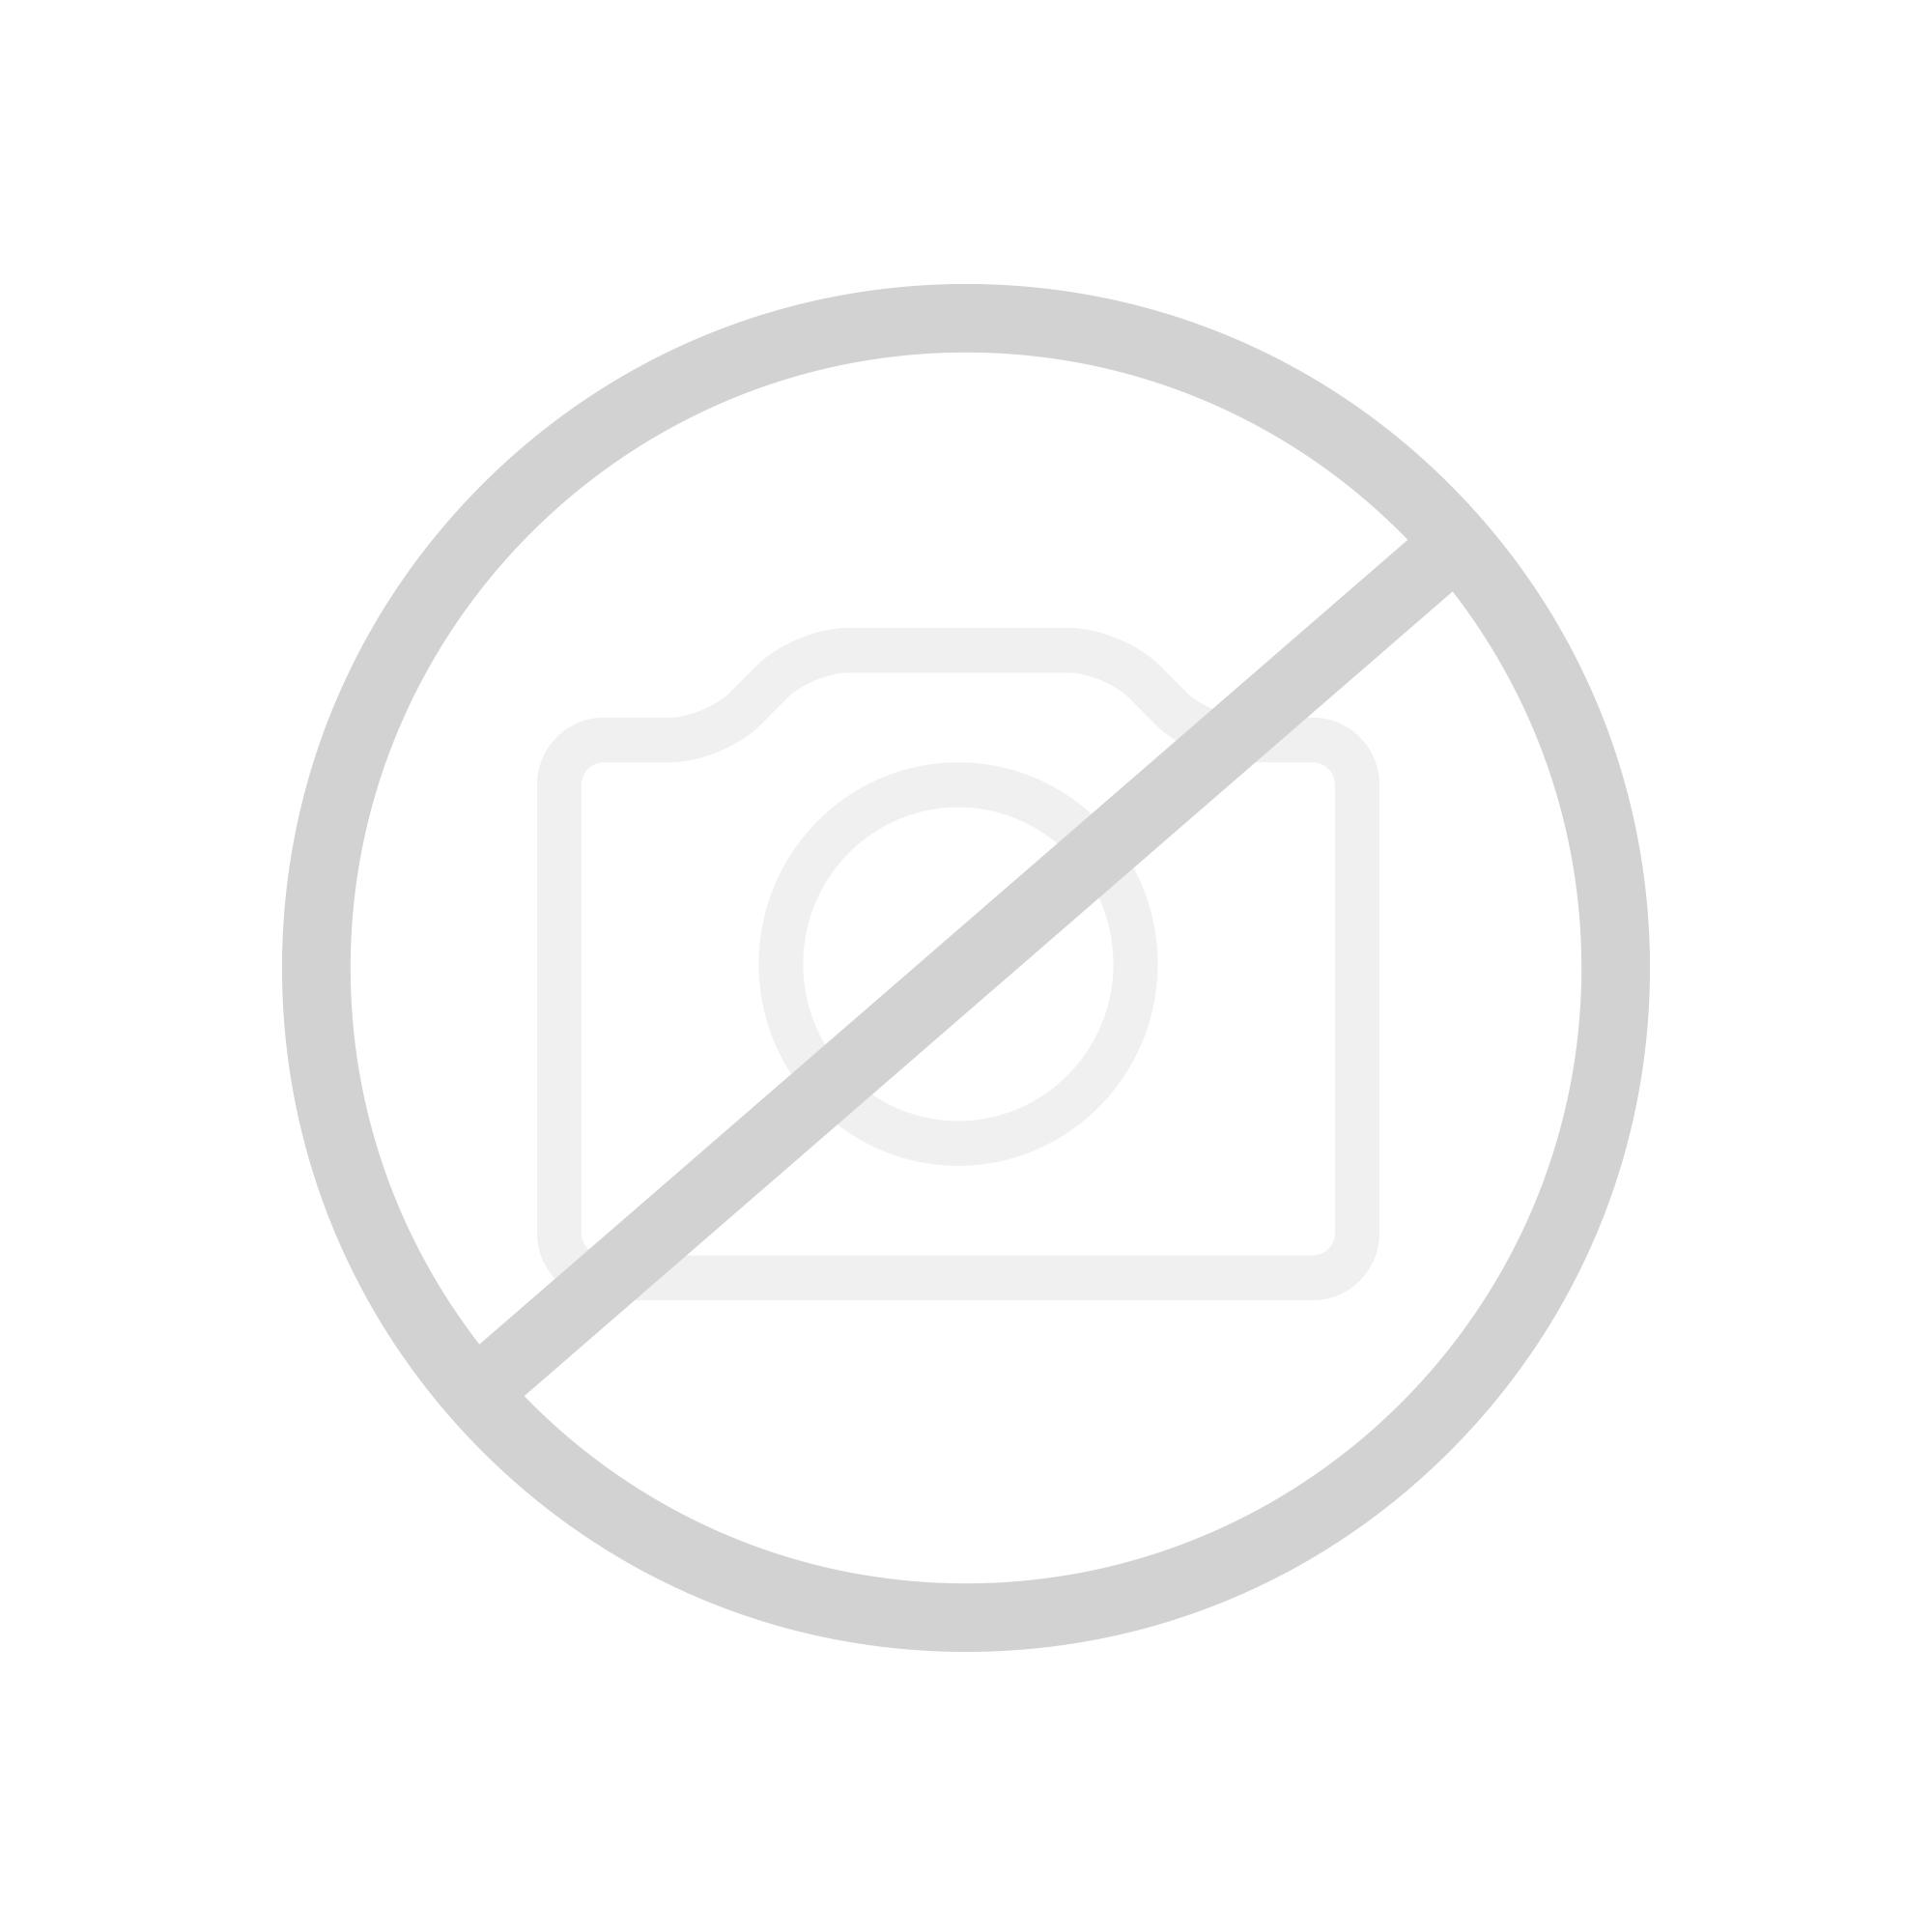 Keuco Moll Reservetoilettenpapierhalter